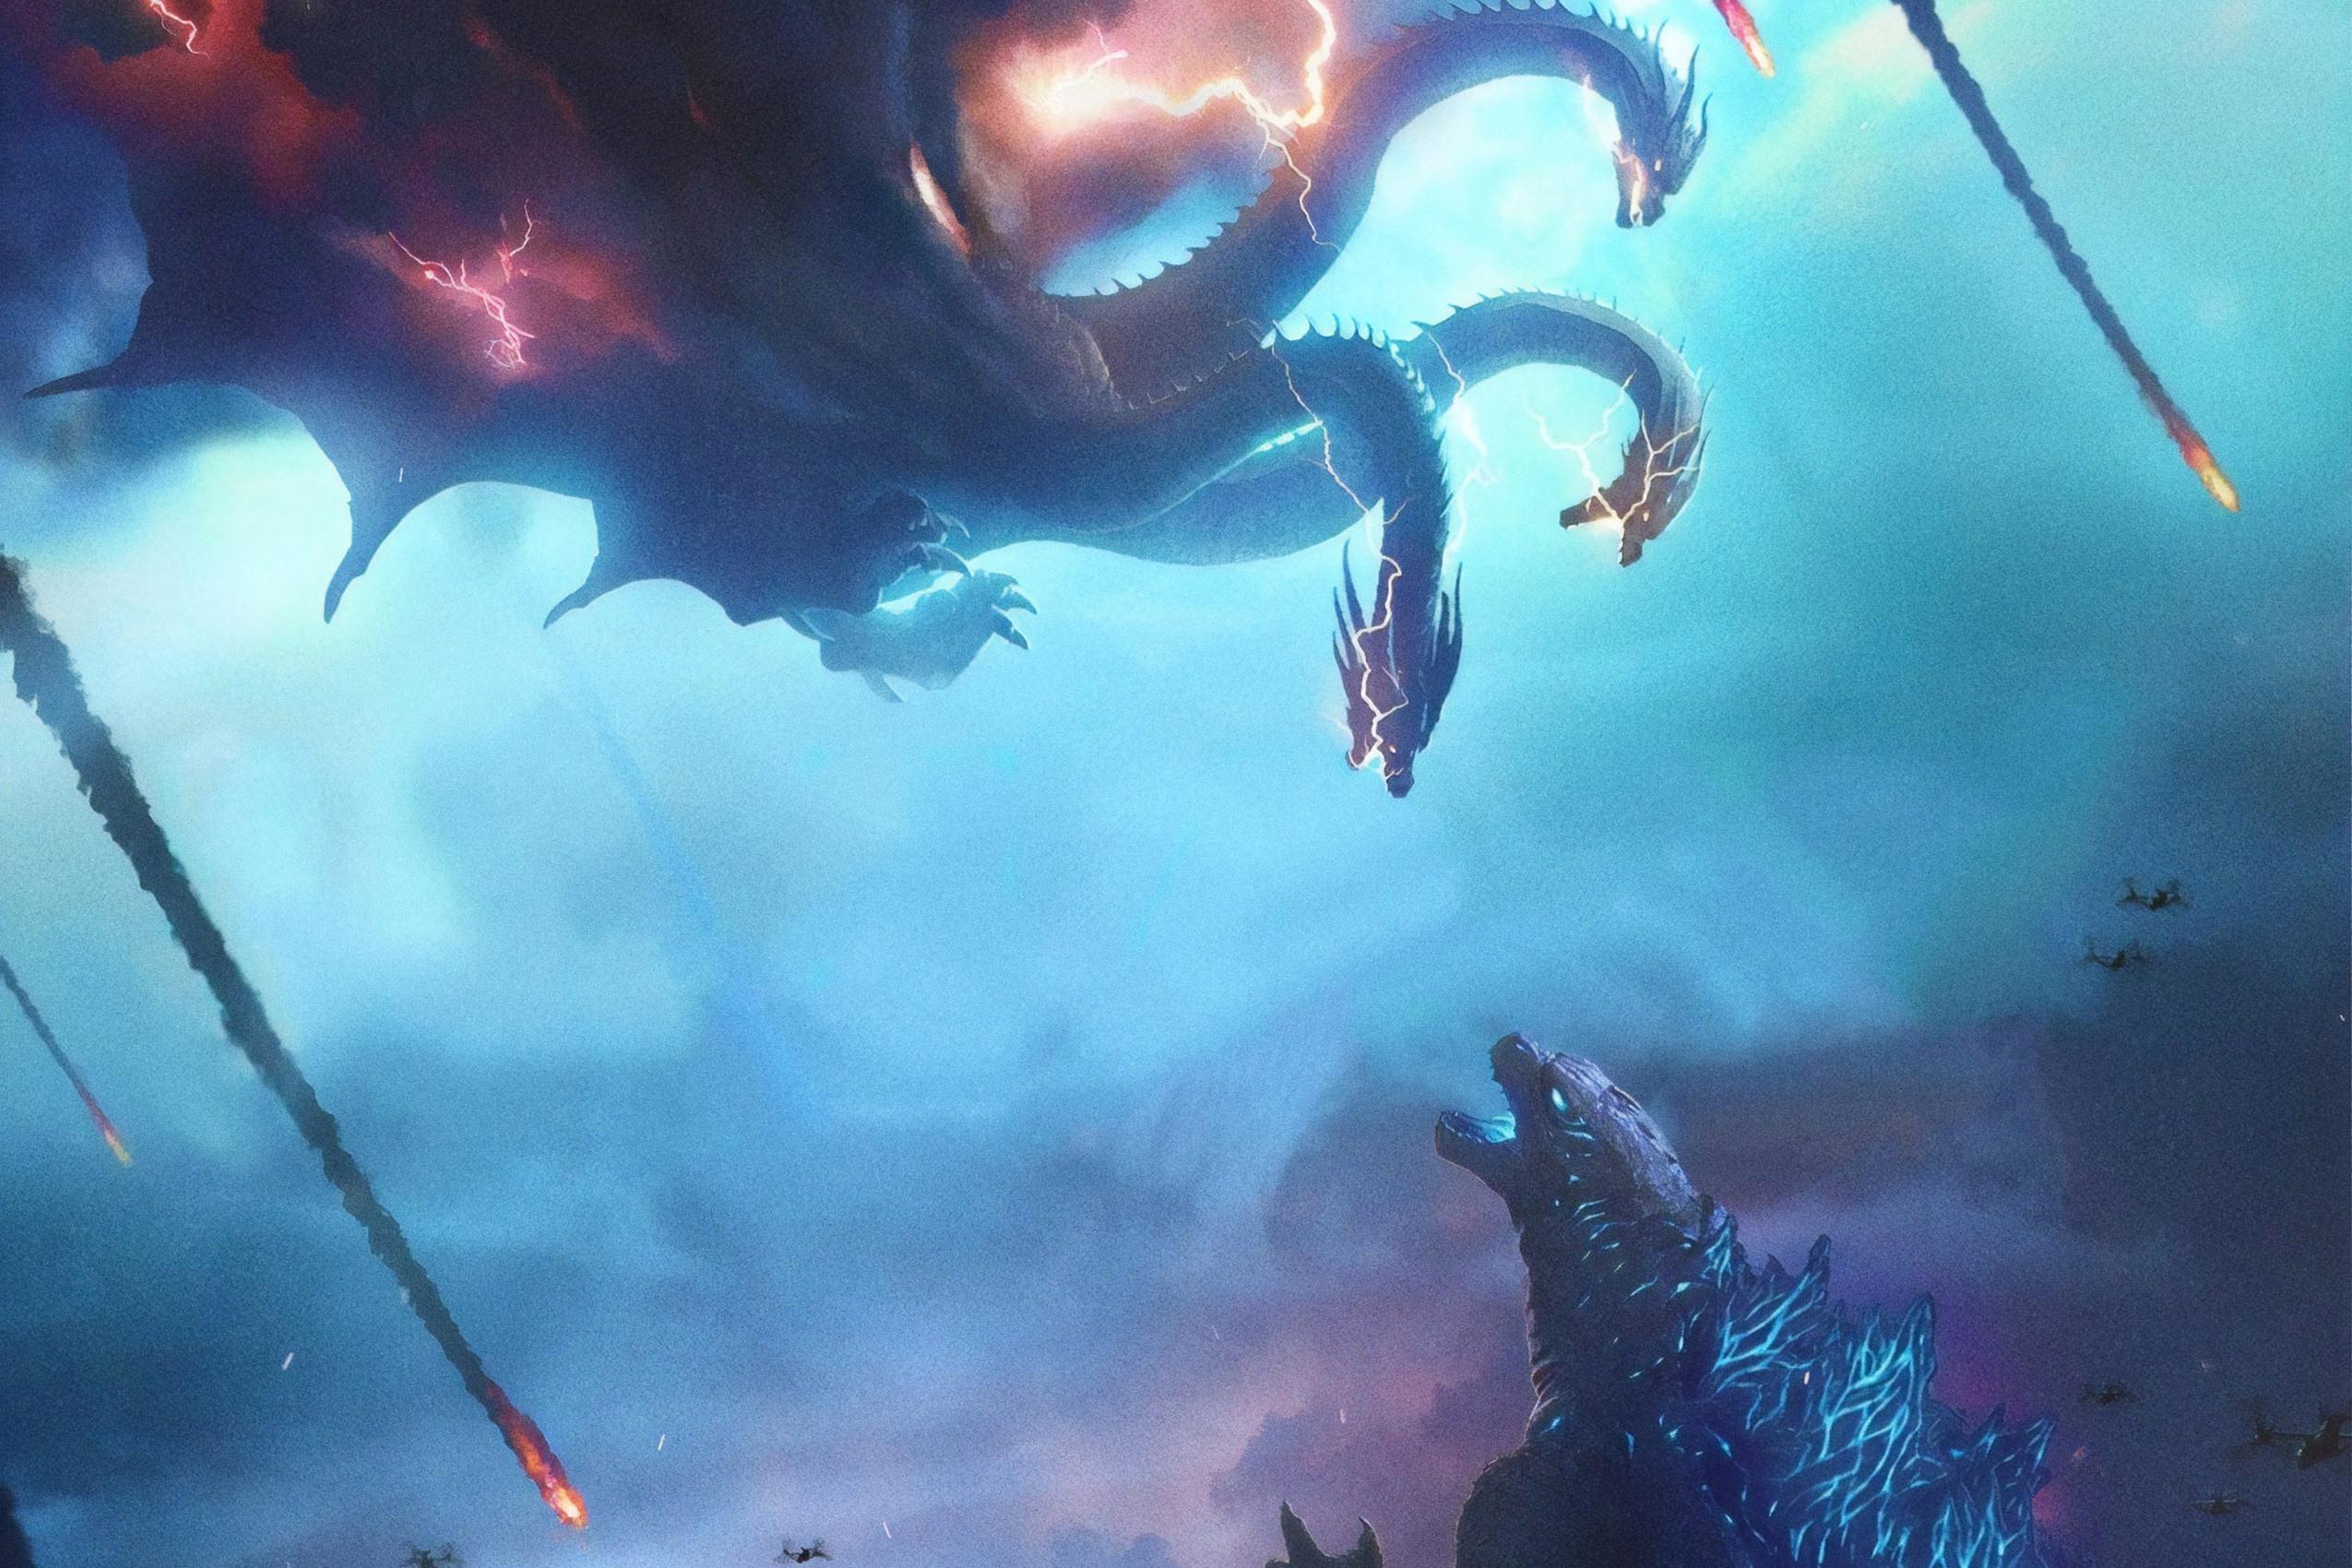 Godzilla Vs 3 Headed Dragon Wallpaper - Godzilla King Of The Monsters Background - HD Wallpaper